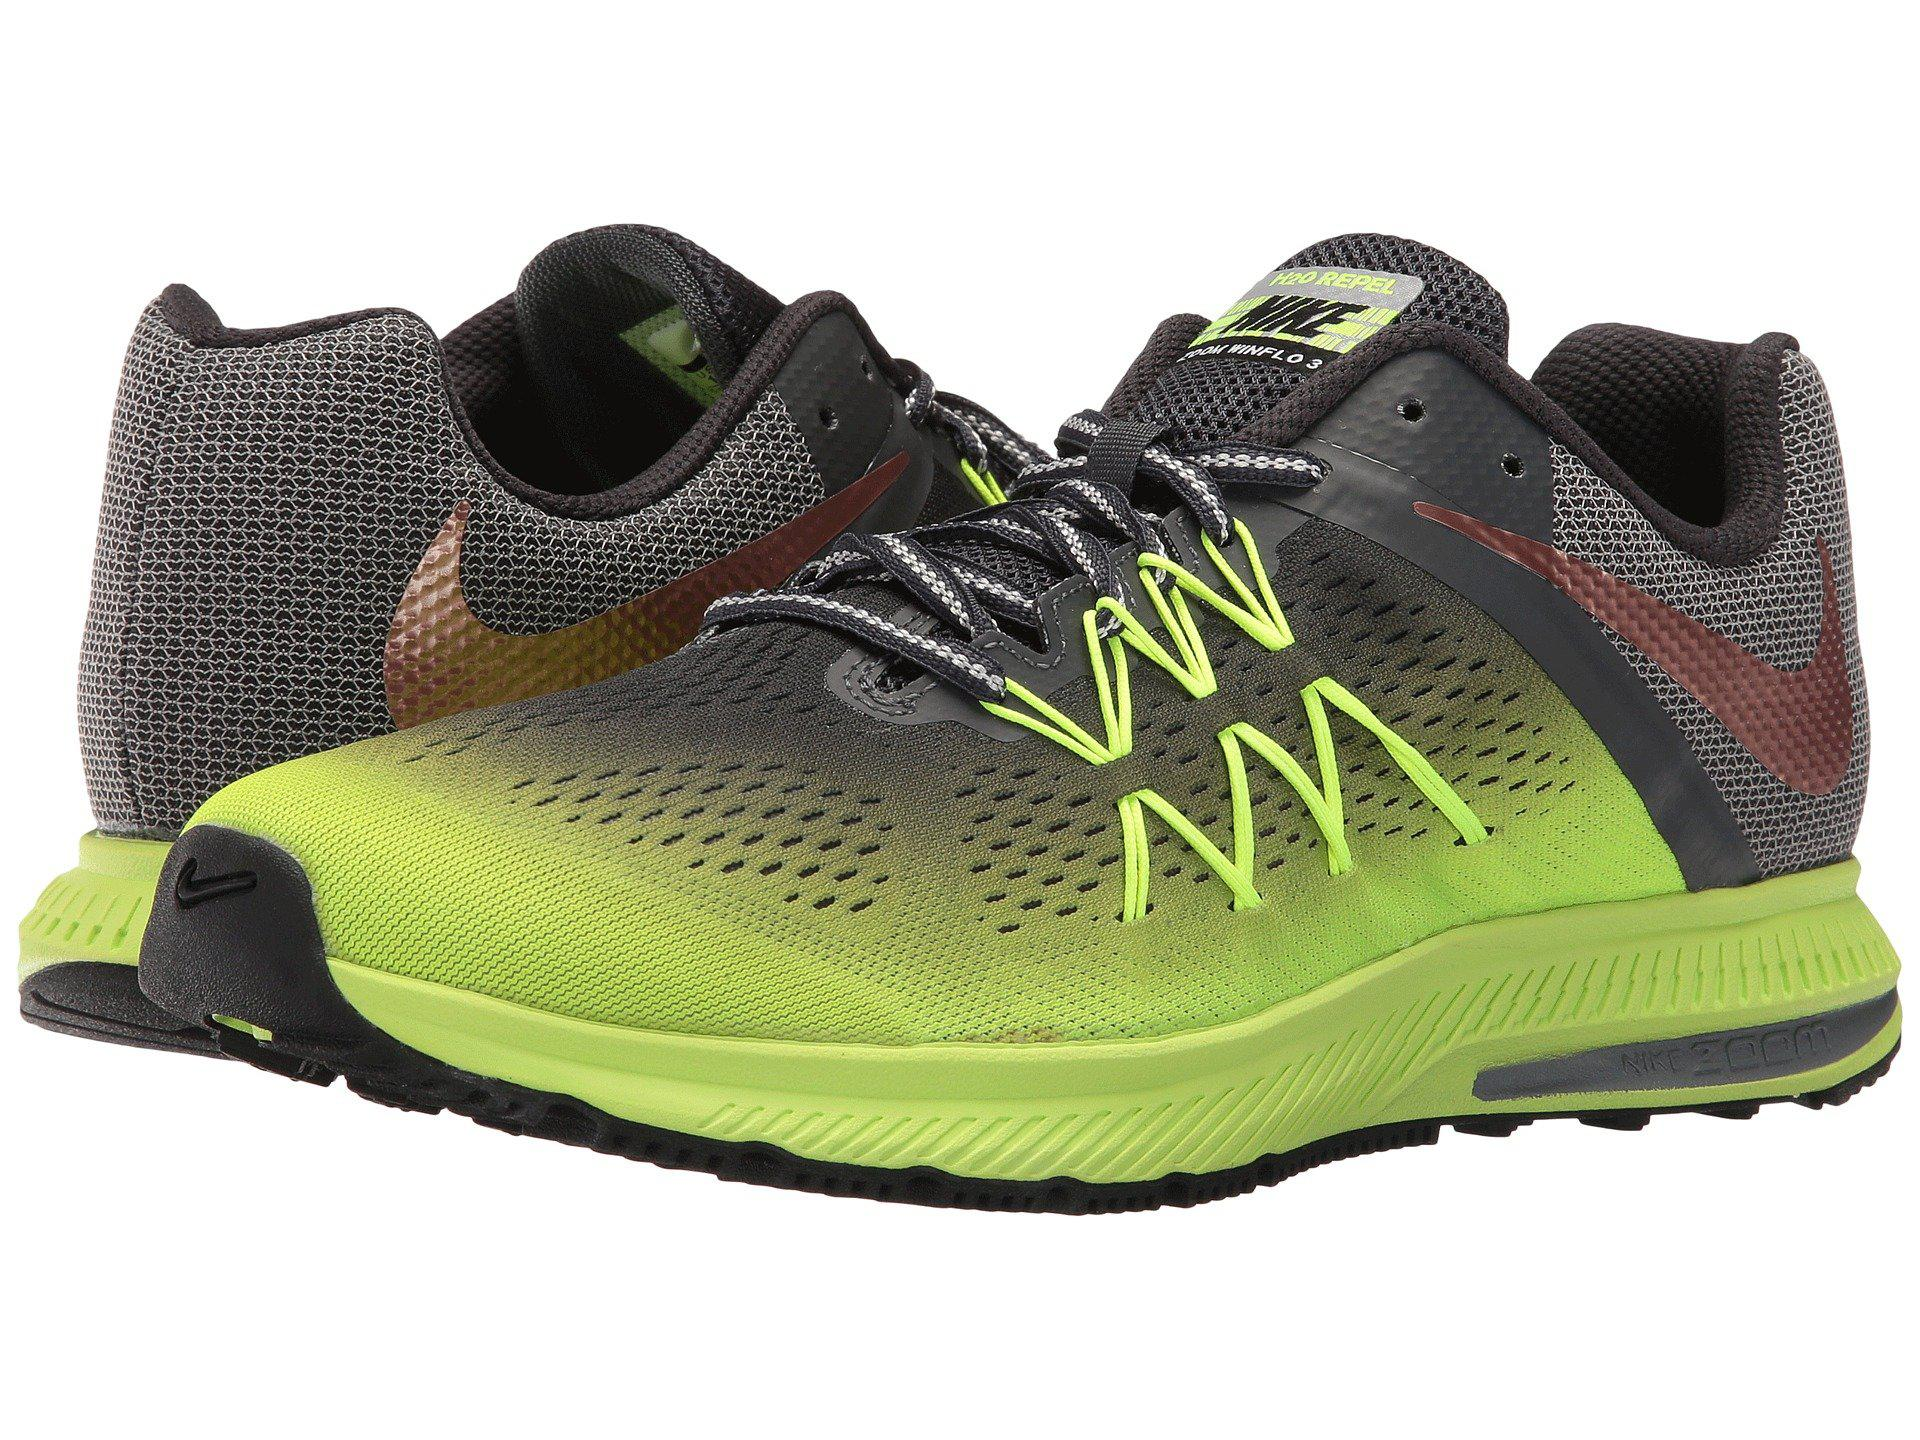 308826516b30 ... running shoes e68ab 203c8  australia nike. mens green air zoom winflo 3  shield 4267b 0ac17